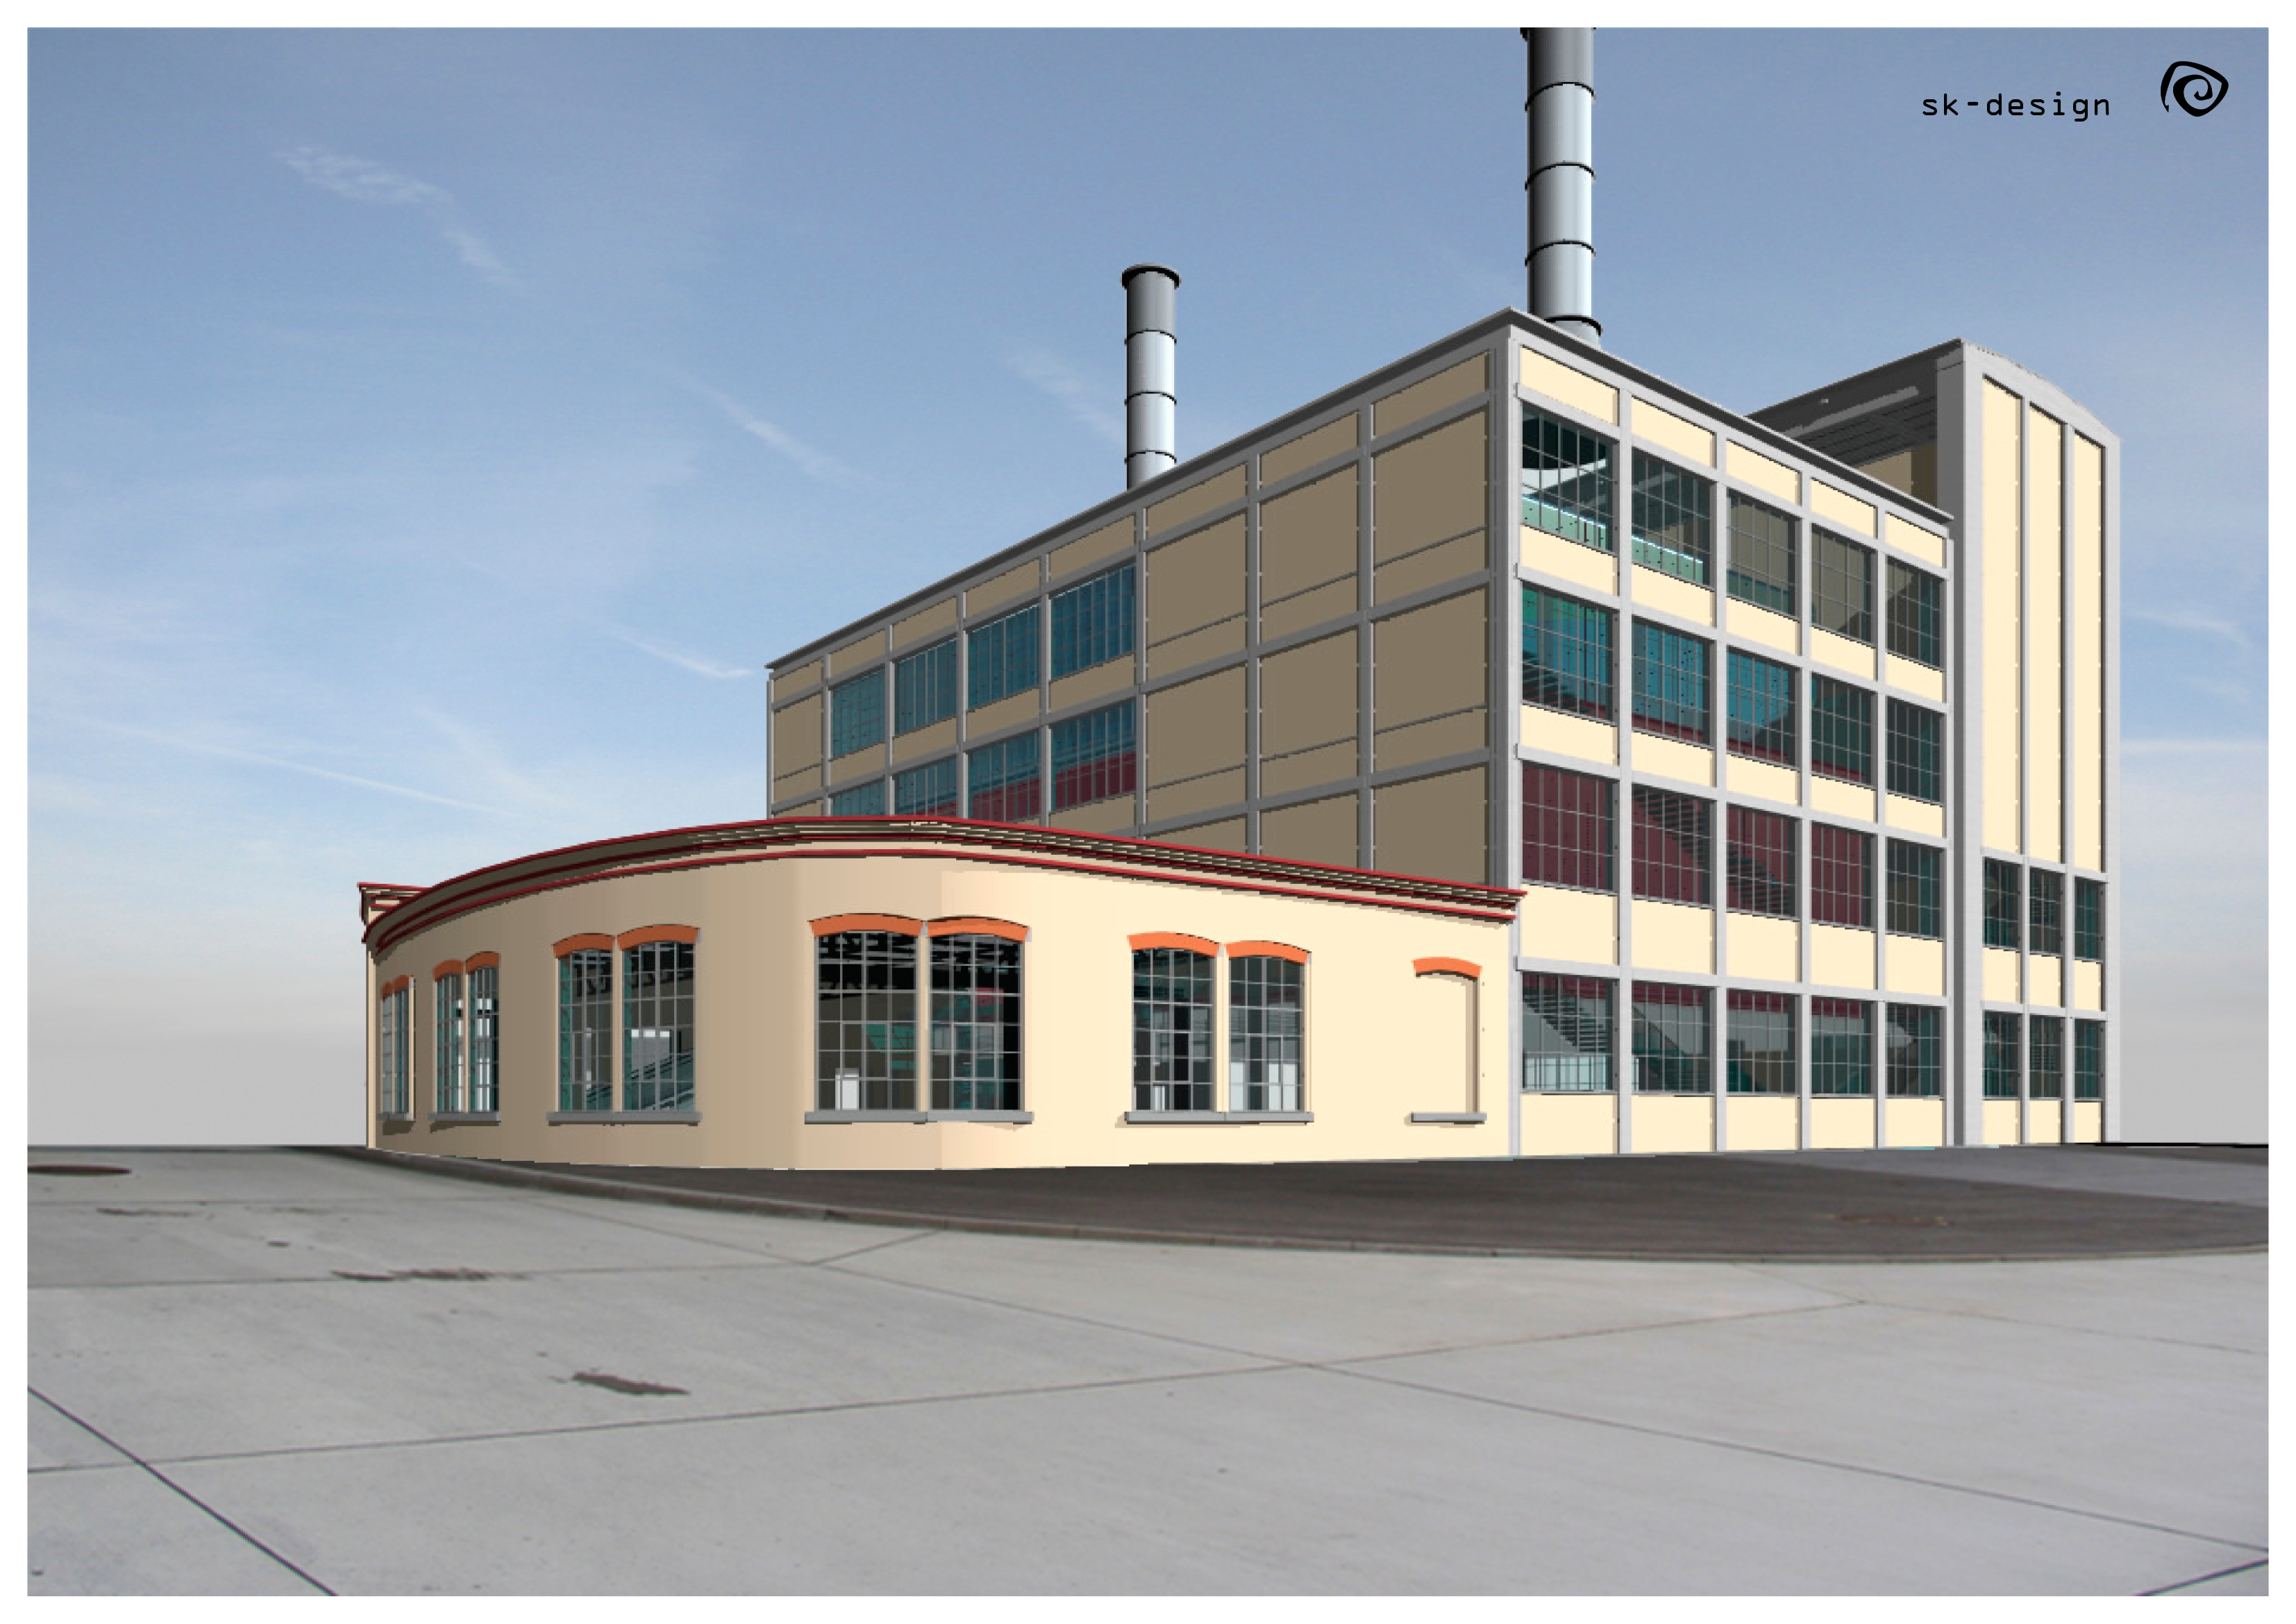 1409-Kesselhaus10.jpg